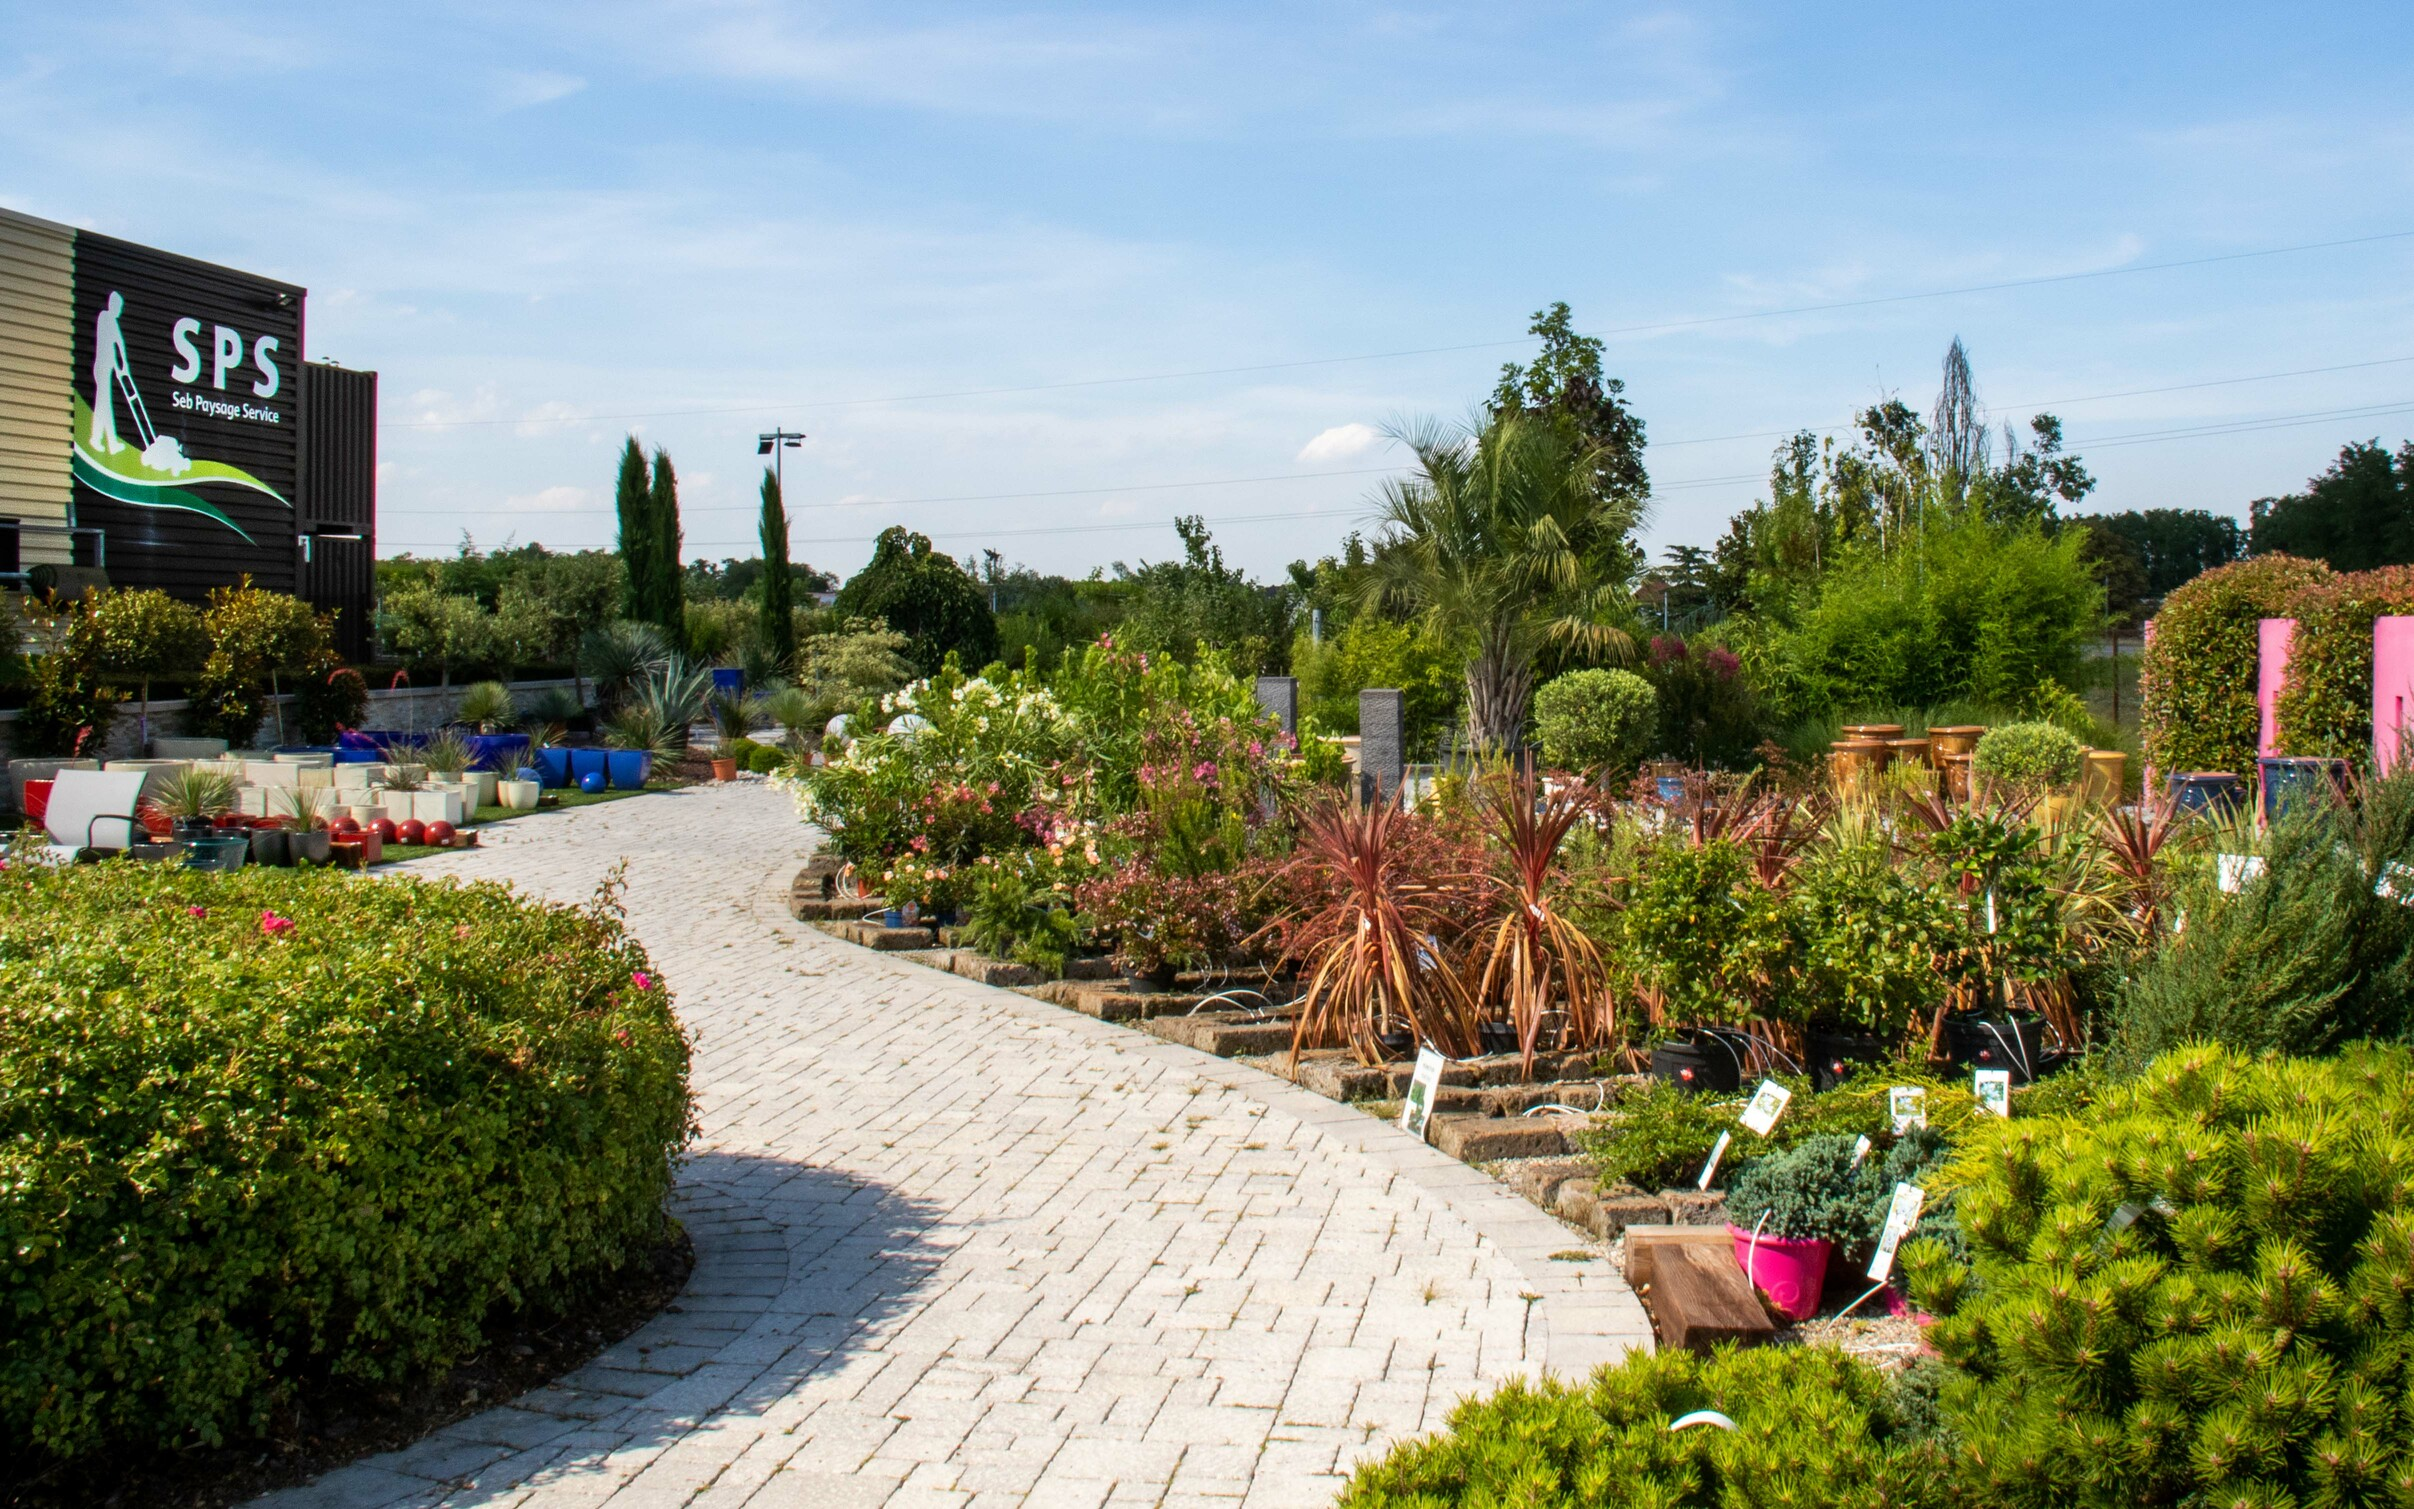 Plantation d'arbuste Bourgoin Jallieu